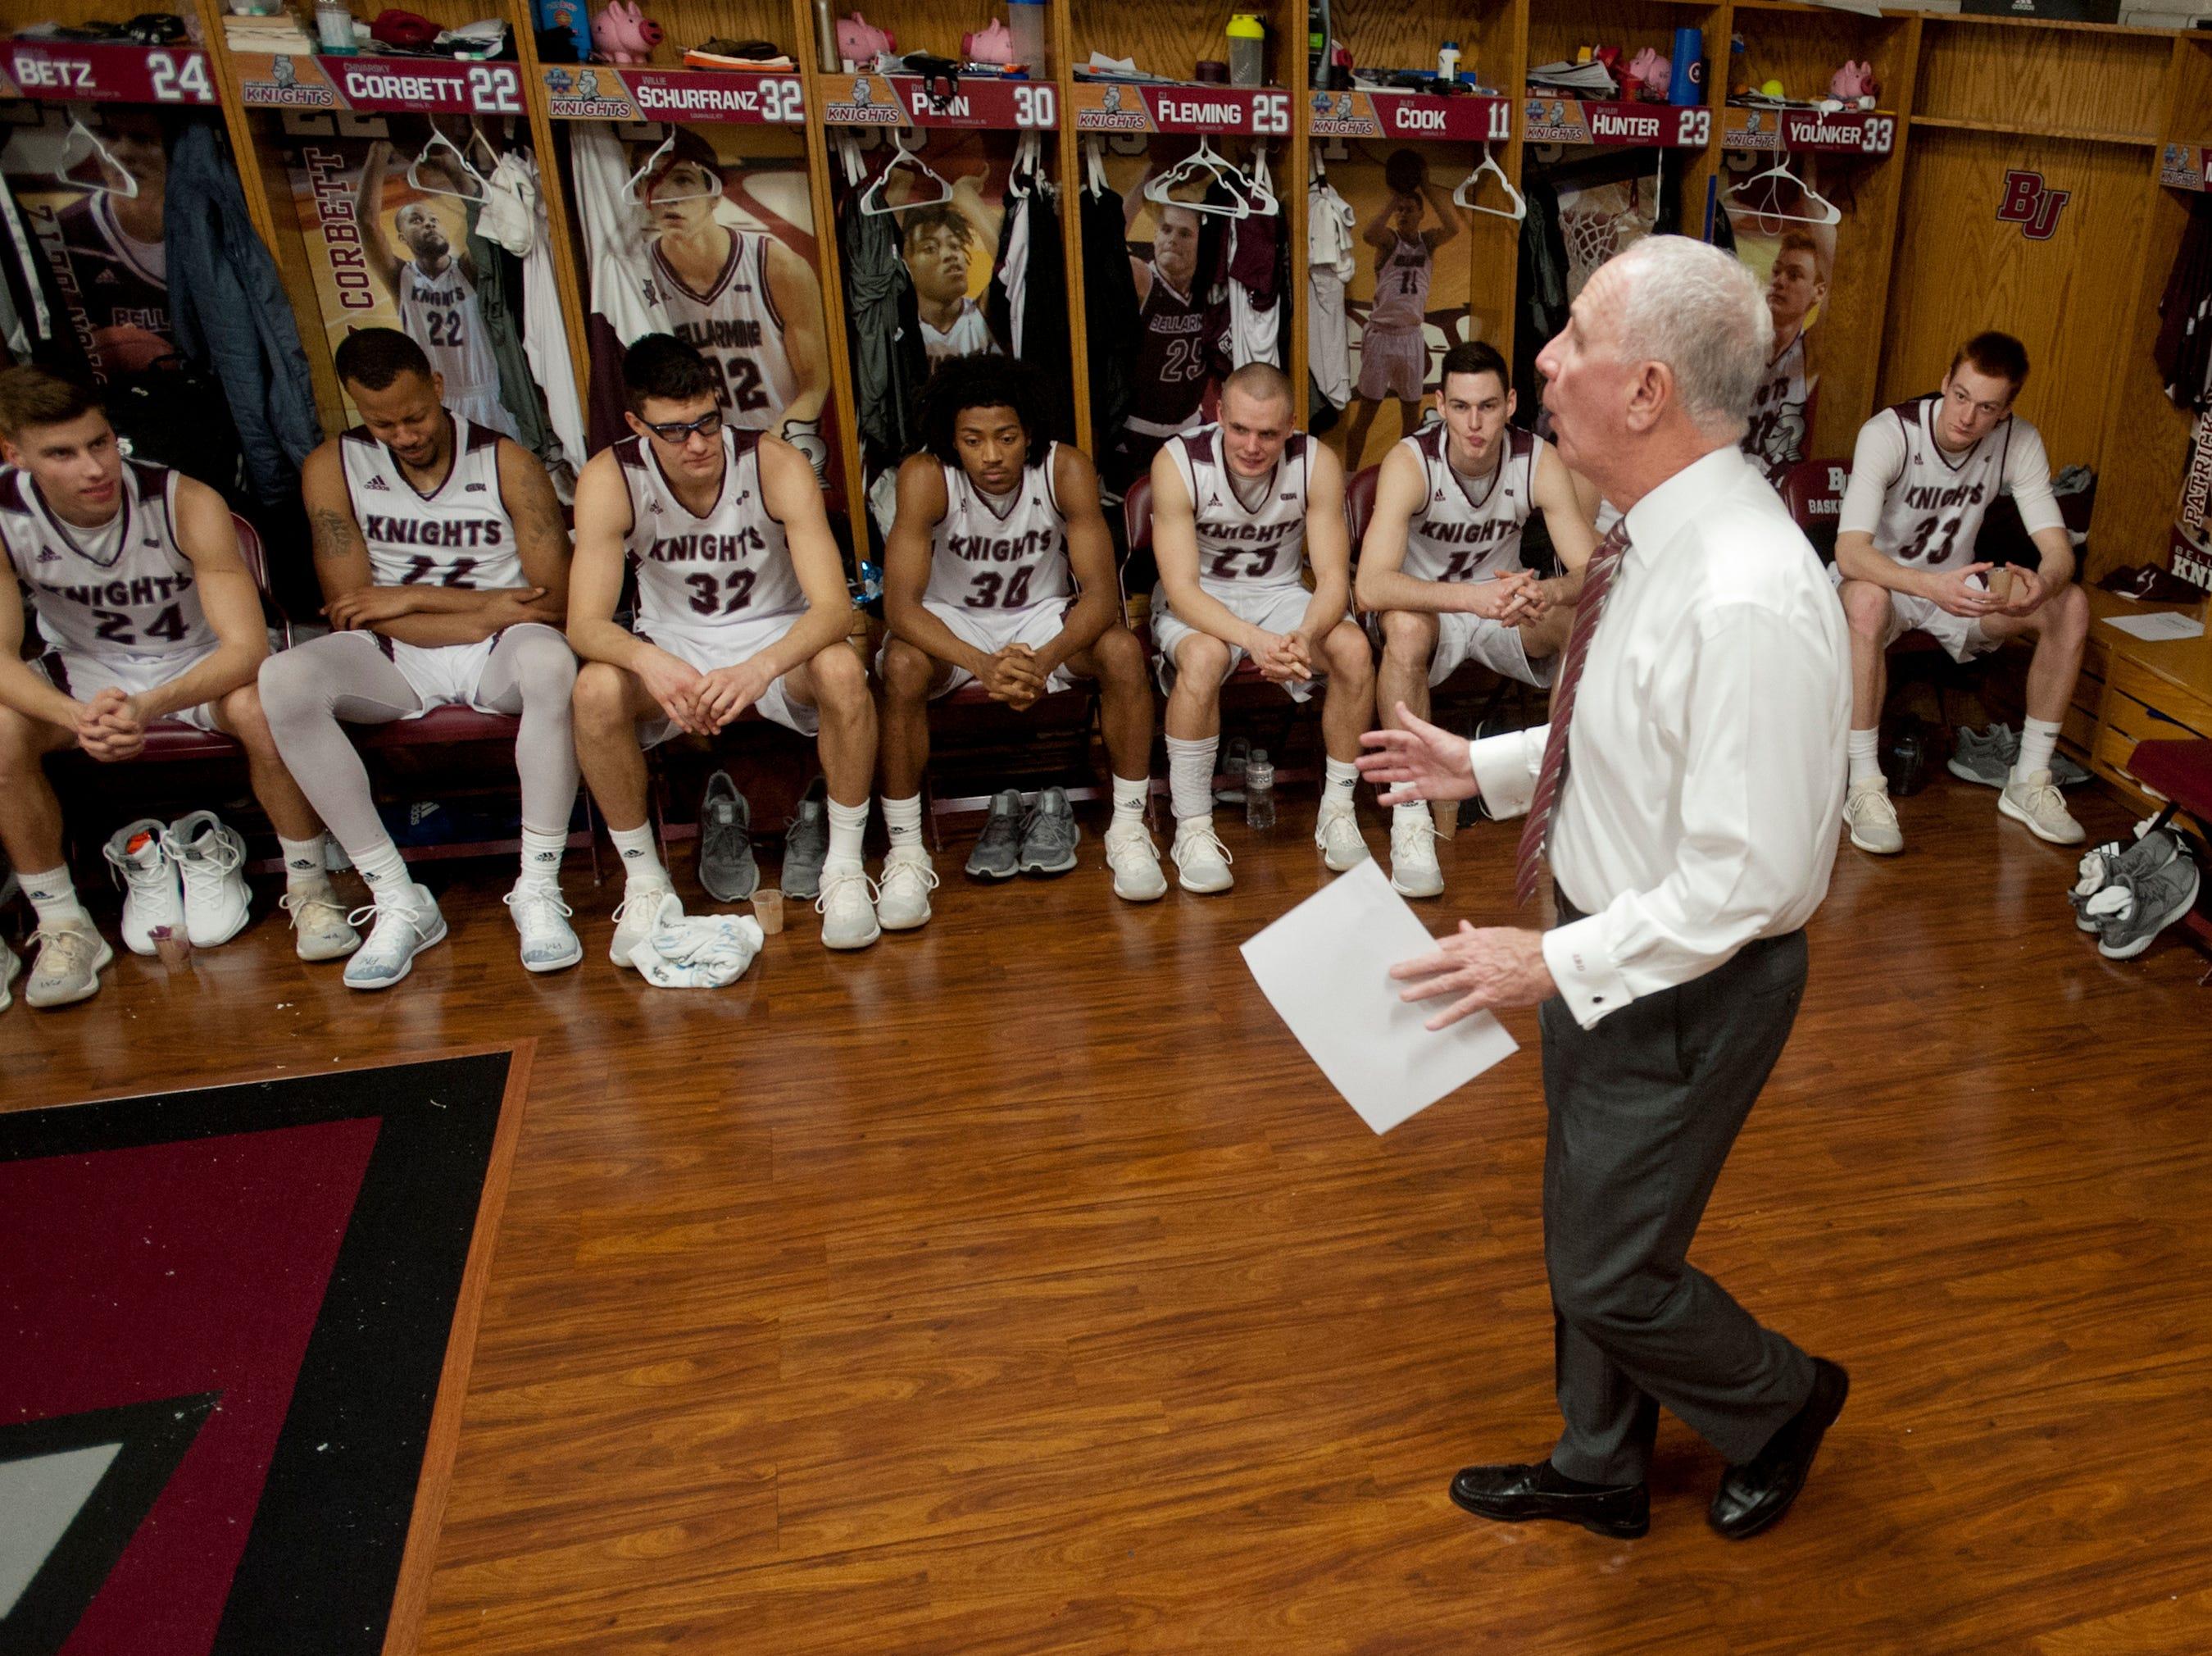 Bellarmine head basketball coach Scott Davenport reviews his team's game performance in the locker room.18 December 2018